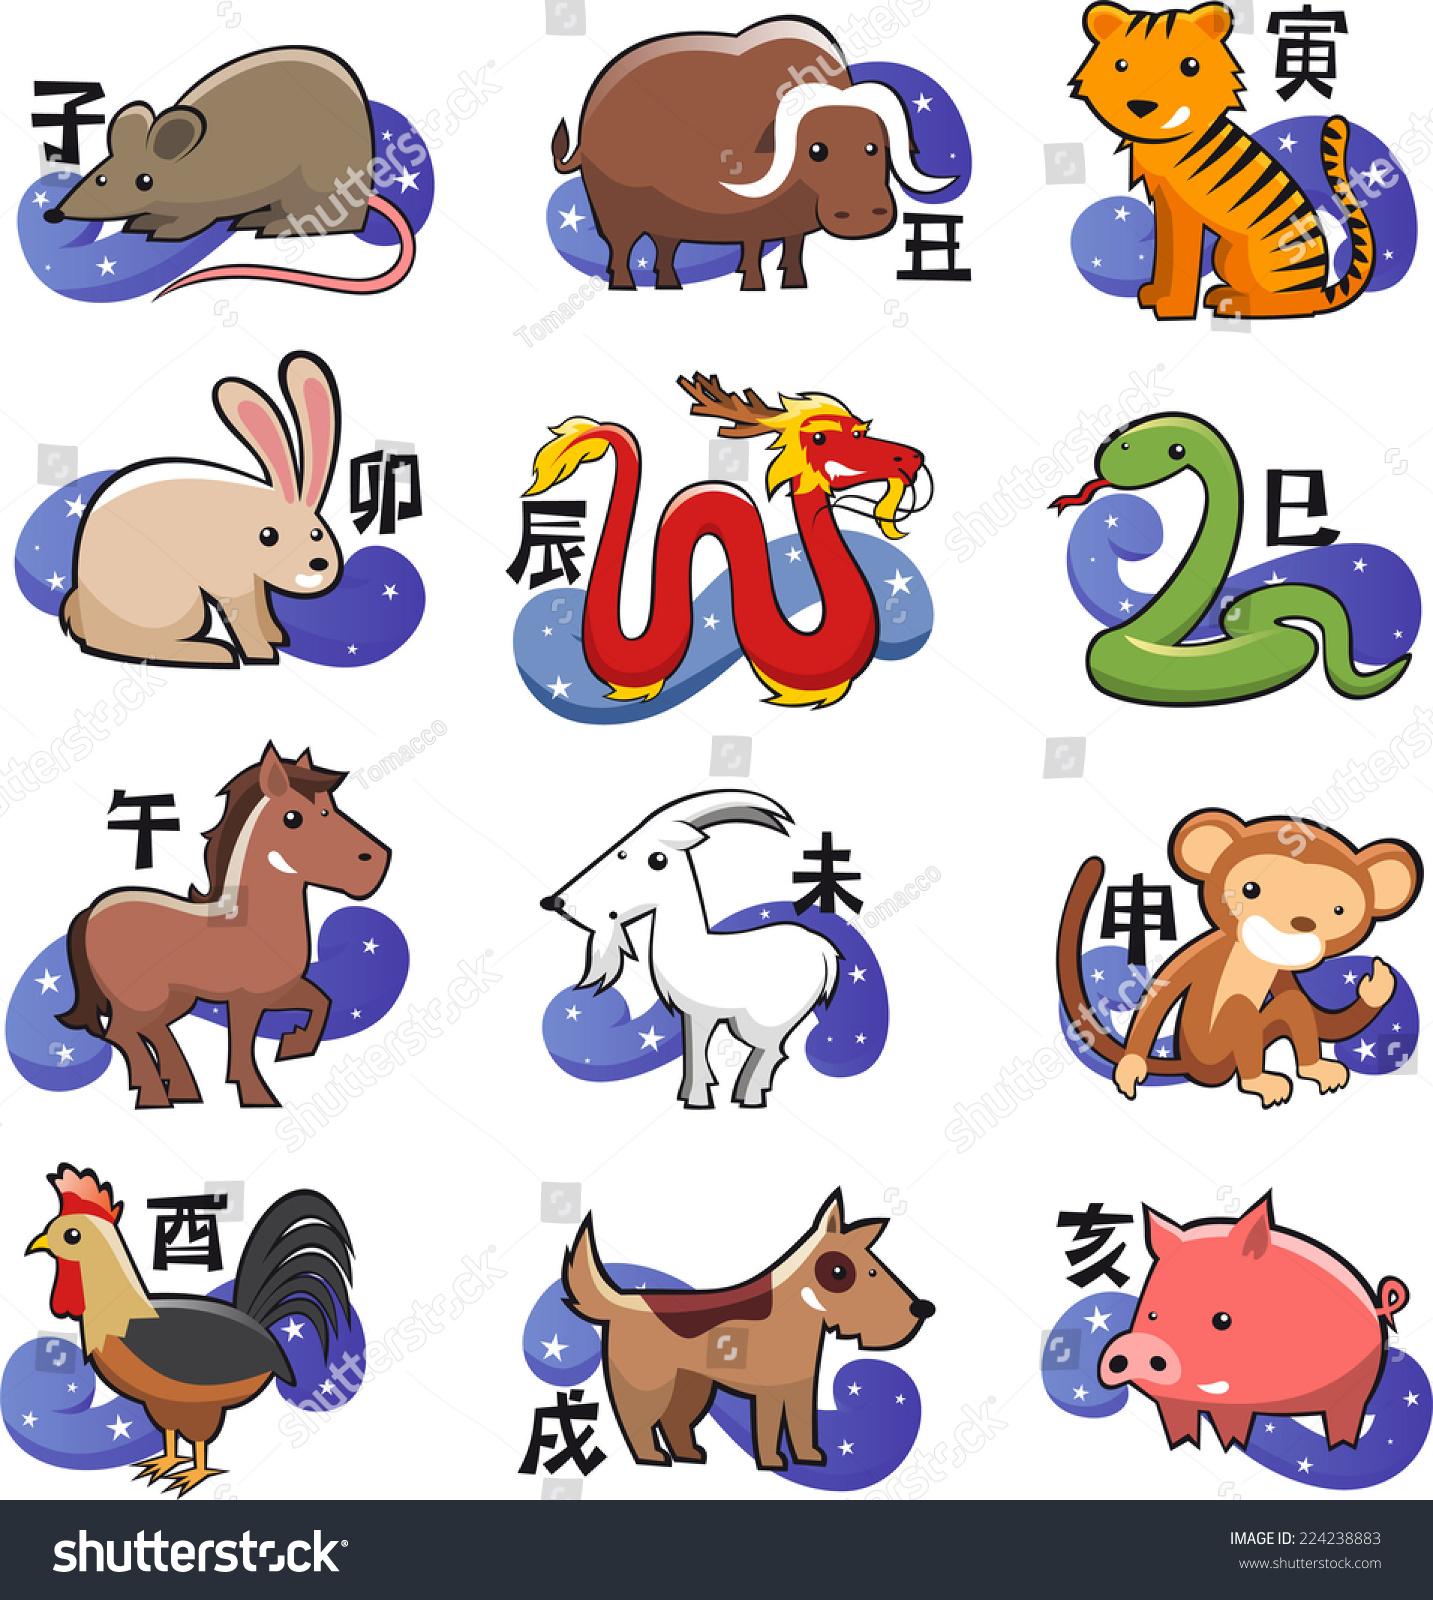 Chinese zodiac sign icon symbols cartoon stock vector 224238883 chinese zodiac sign icon symbols cartoon vector illustration biocorpaavc Gallery